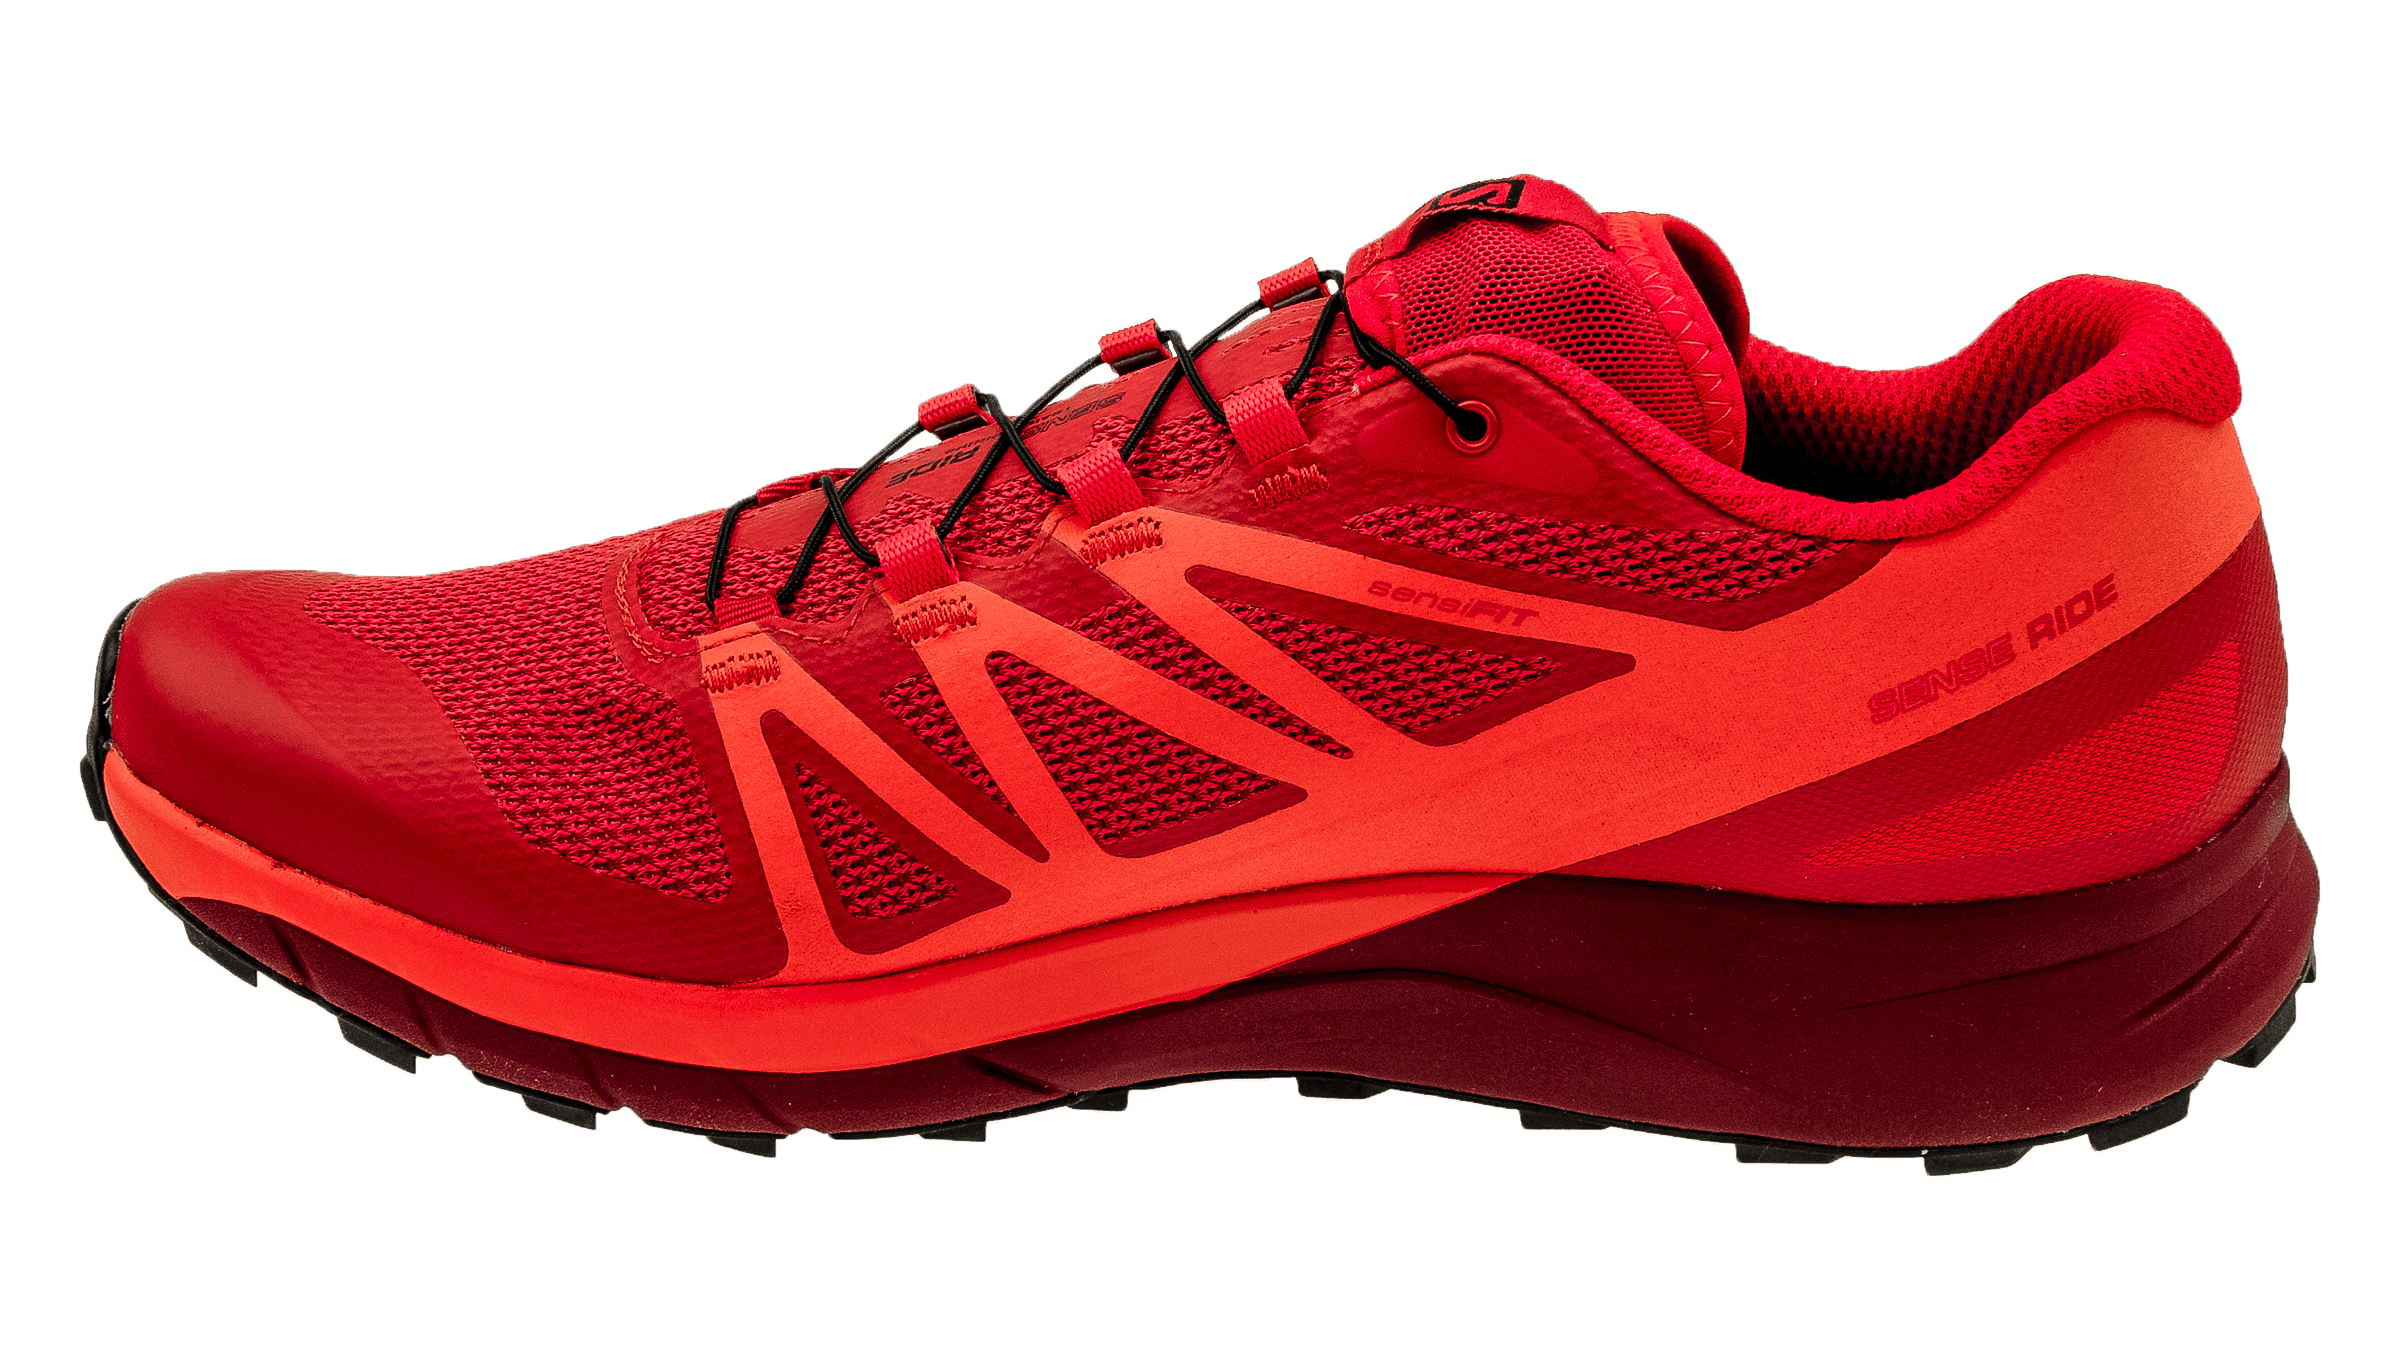 new product 83300 7e5f5 Salomon Sense Ride Fiery Red/Scarlet Ibis/Red Dalhia